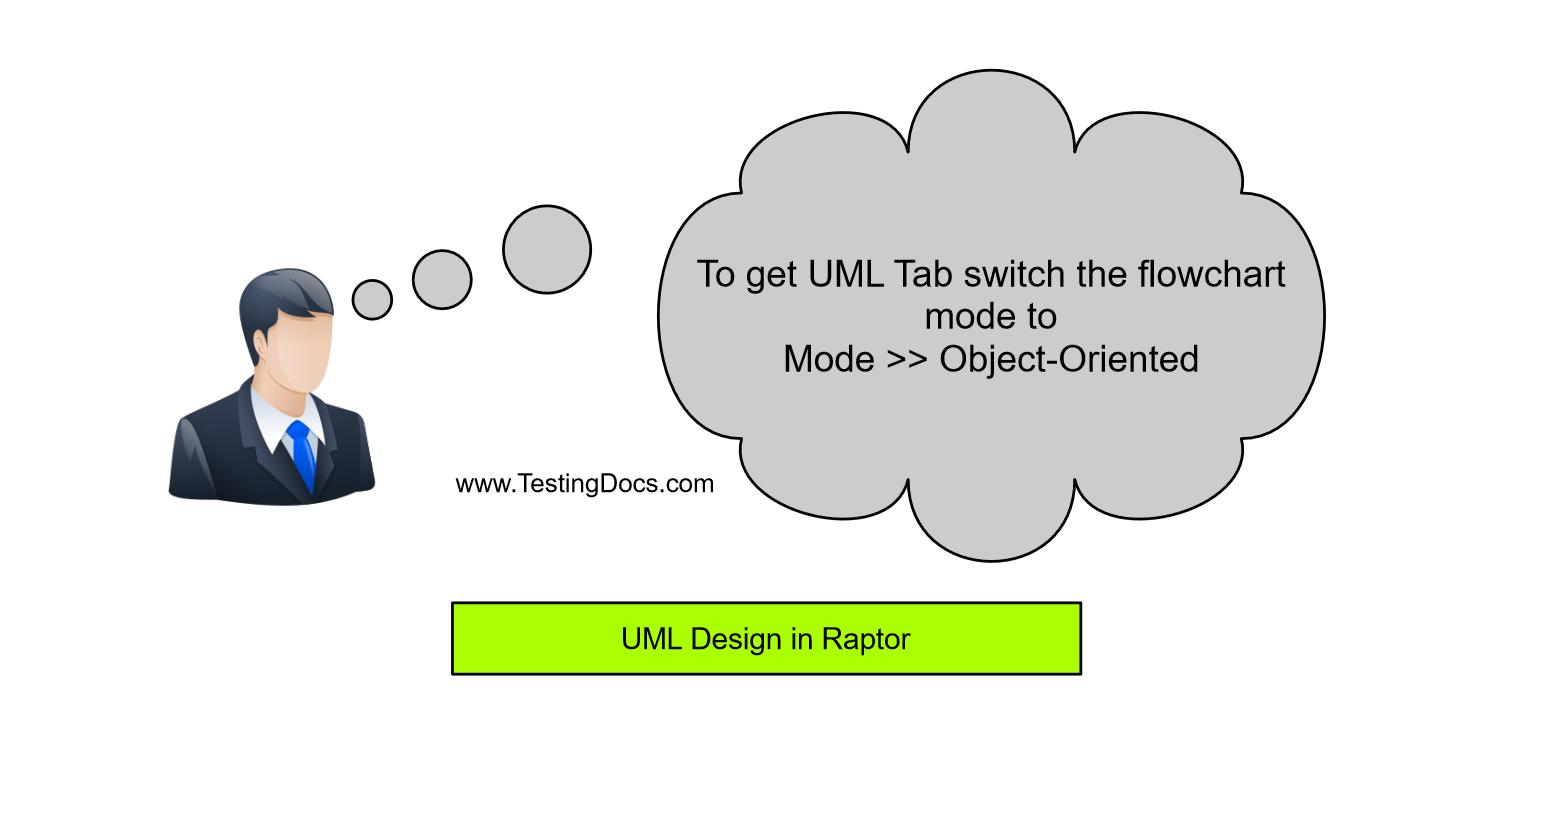 UML Design Raptor